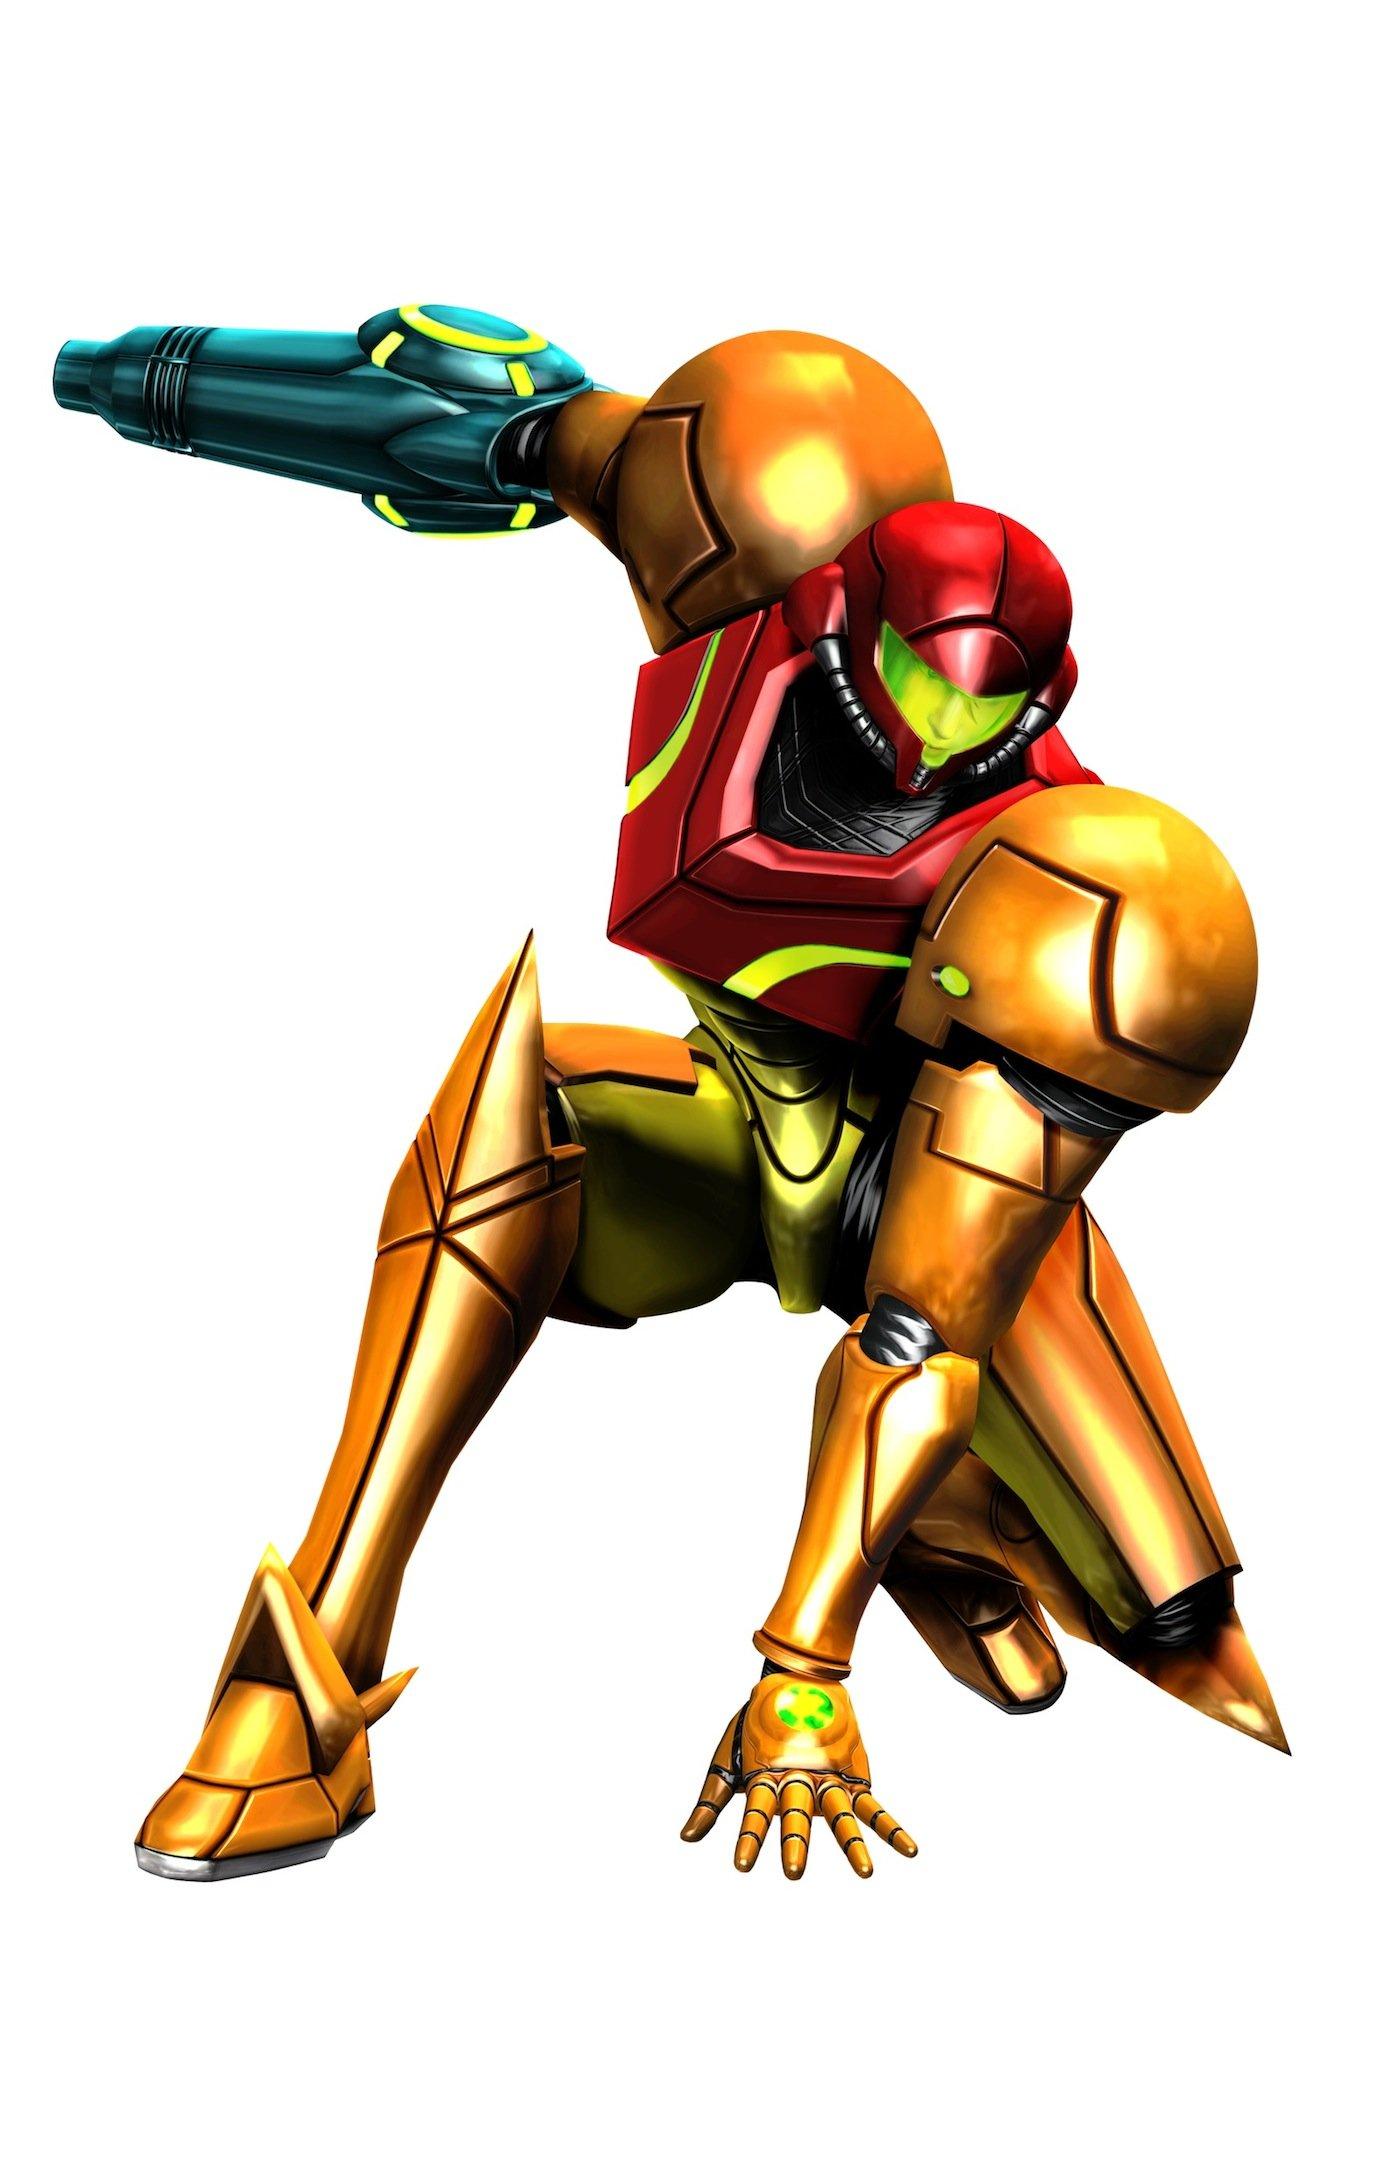 MetroidOtherM Wii Art002